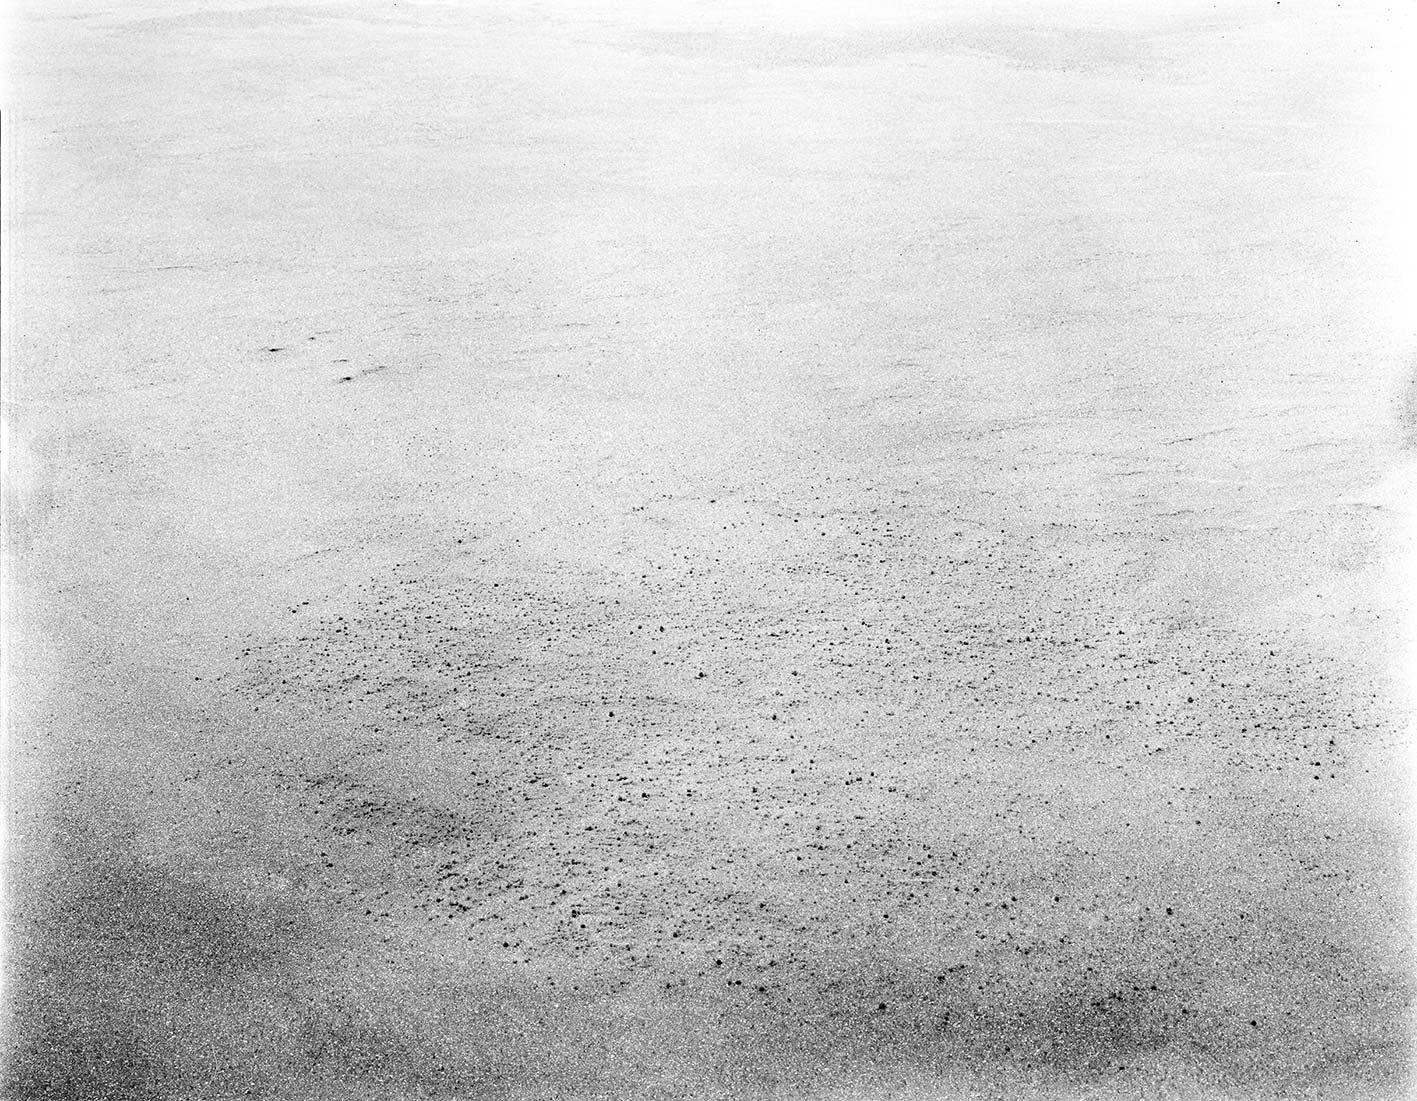 ©-Ester-Vonplon,-Untitled,-2014,-Photography-Print-on-Baryta,-130-x-100cm.-Courtesy-of-Galerie-Stephan-Witschi